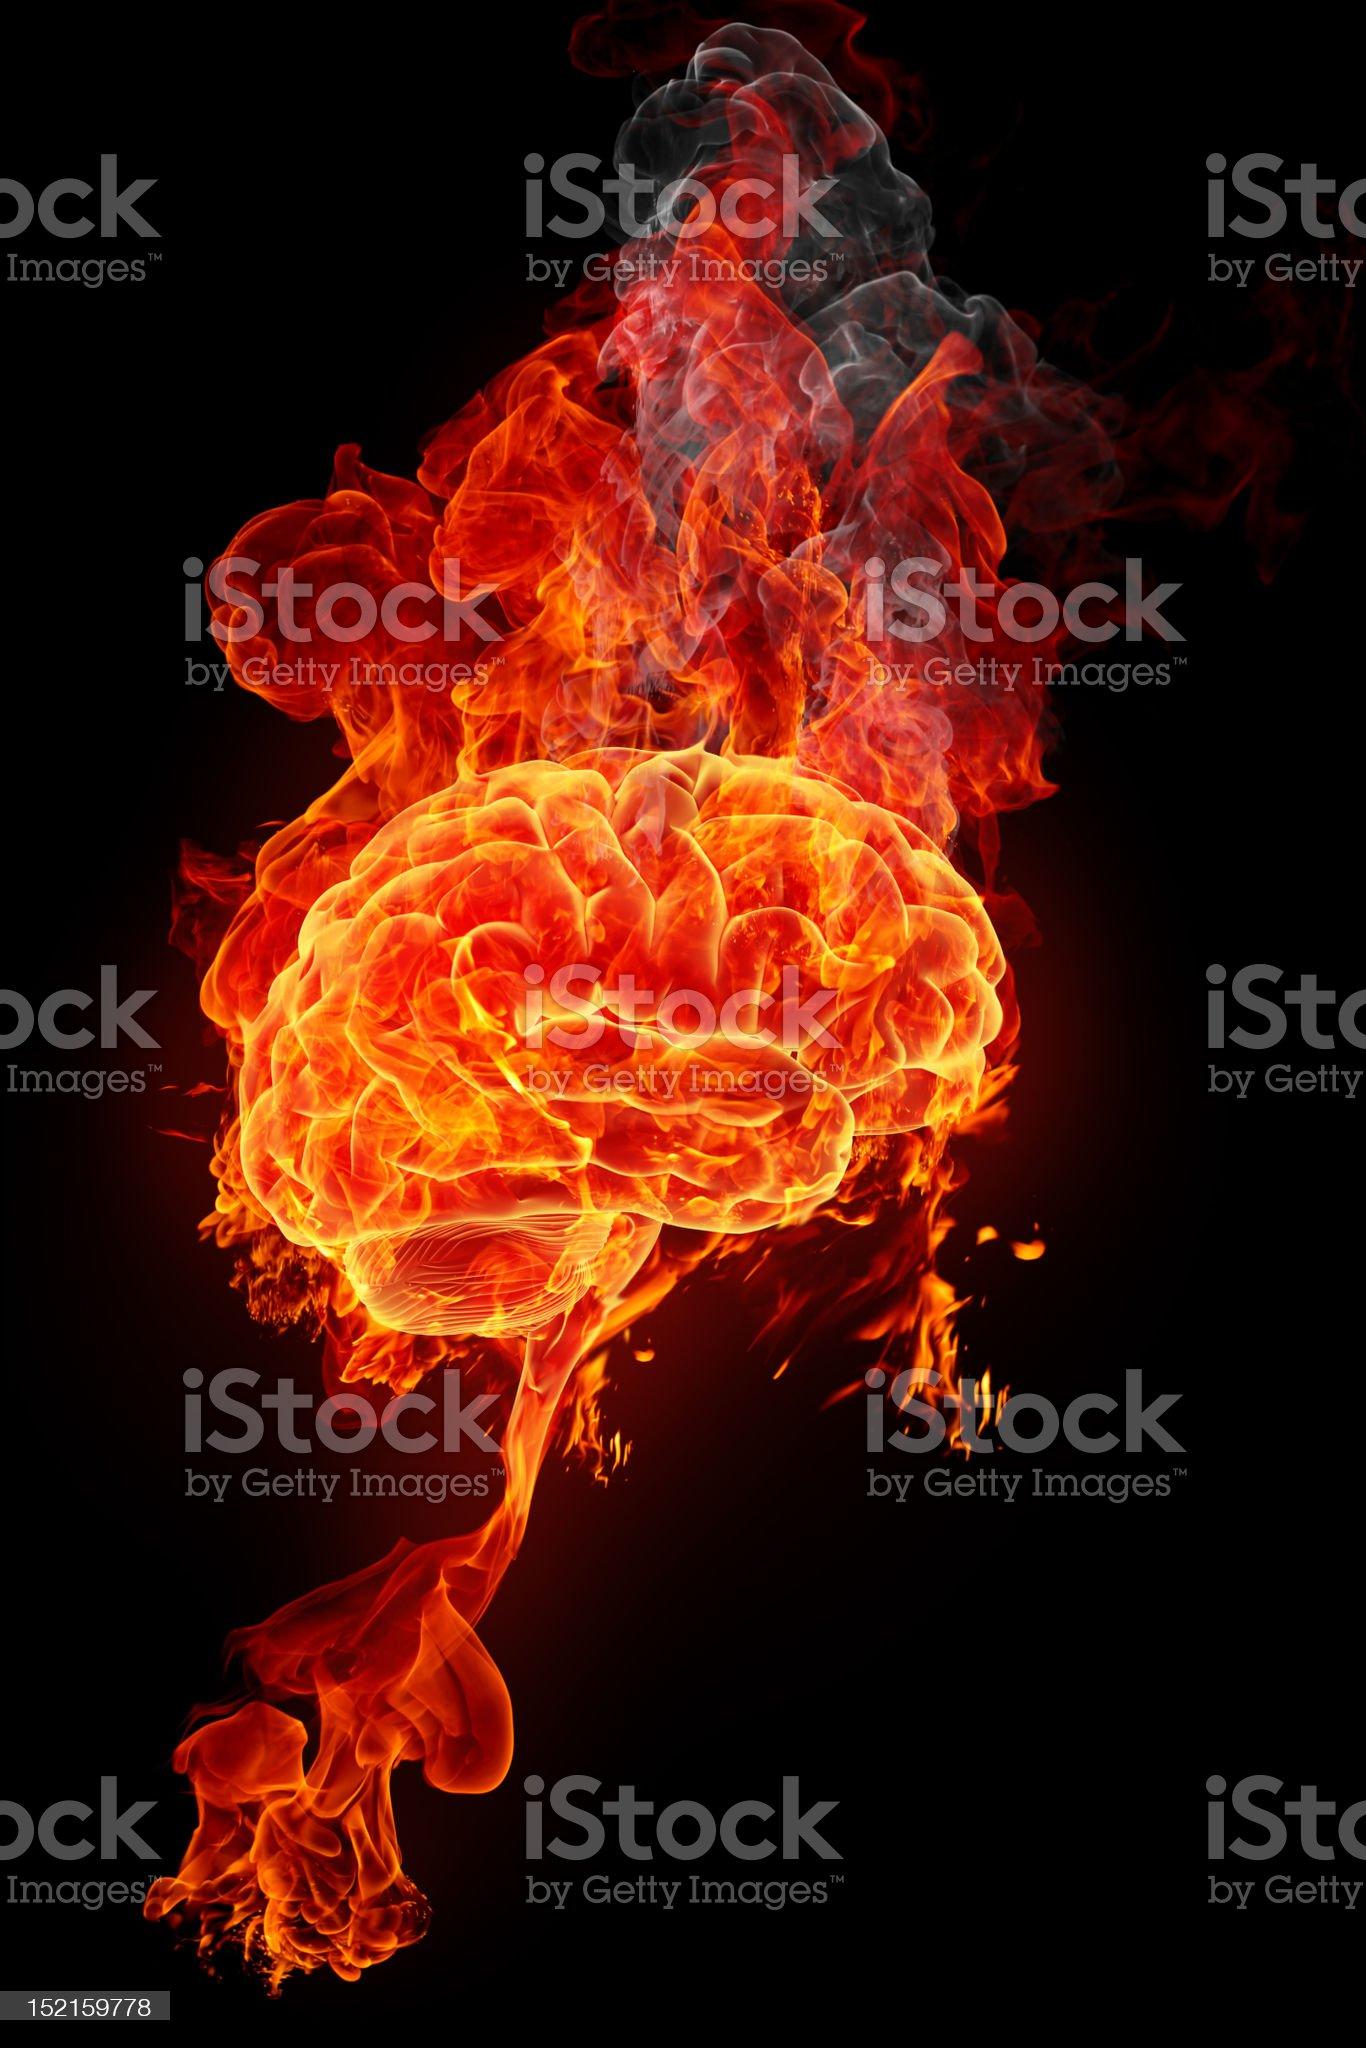 burning brain royalty-free stock photo